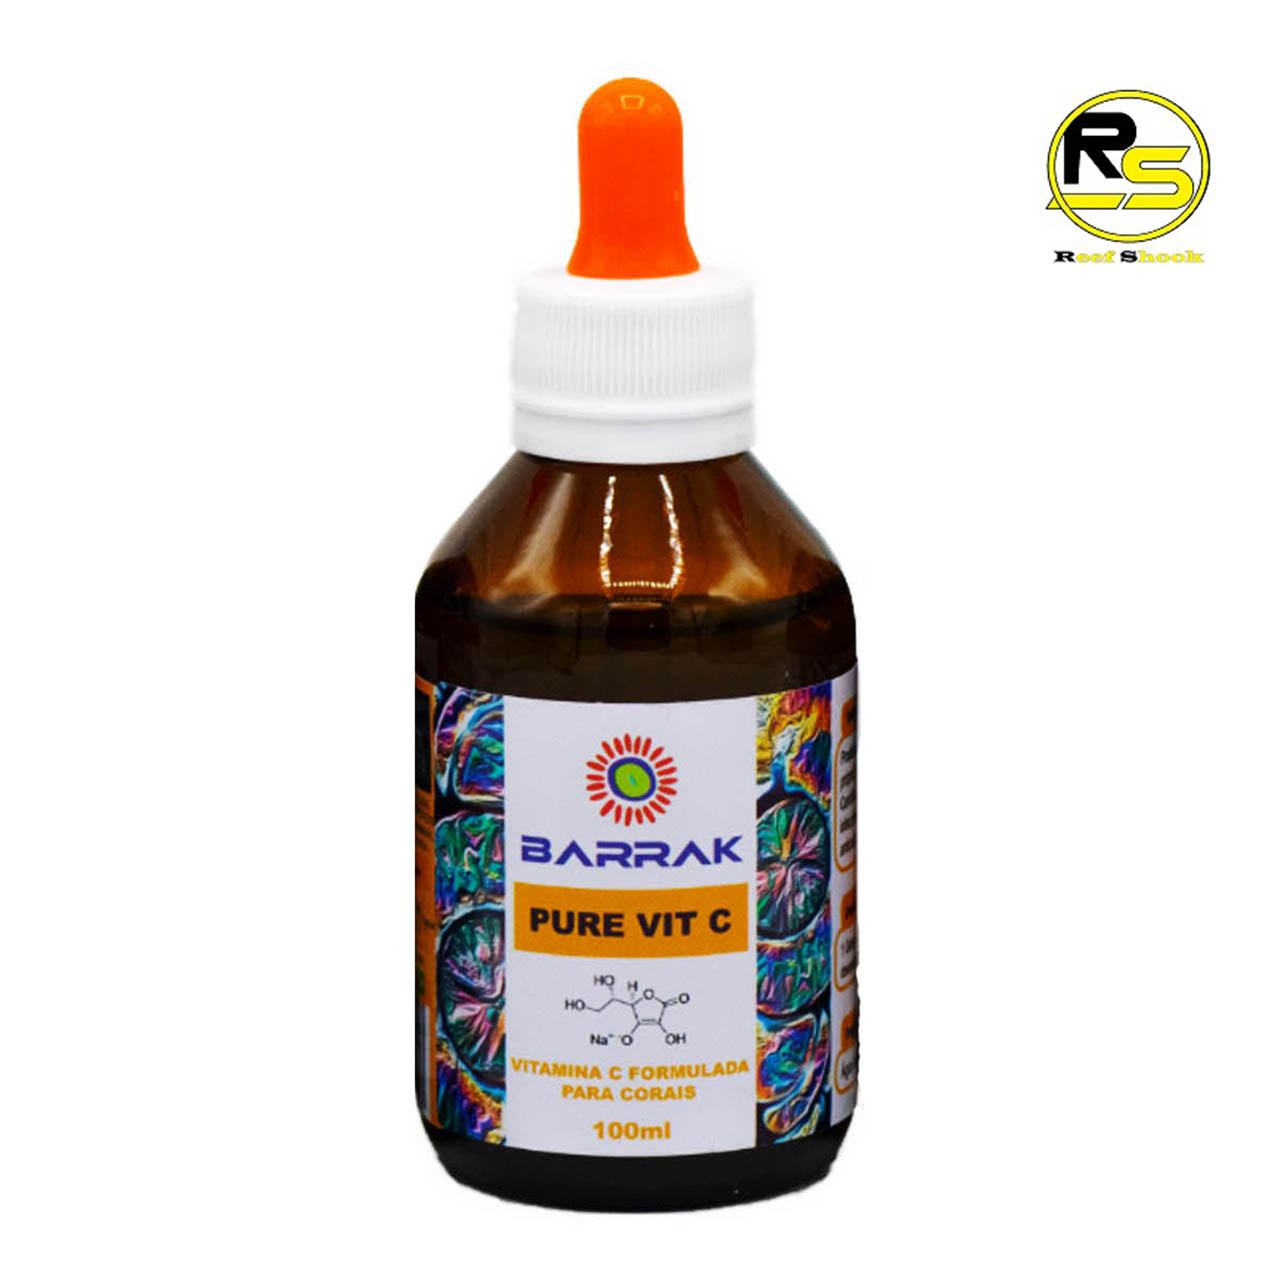 Pure Vit C Antioxidantes e Vitamina C Barrak 100ml